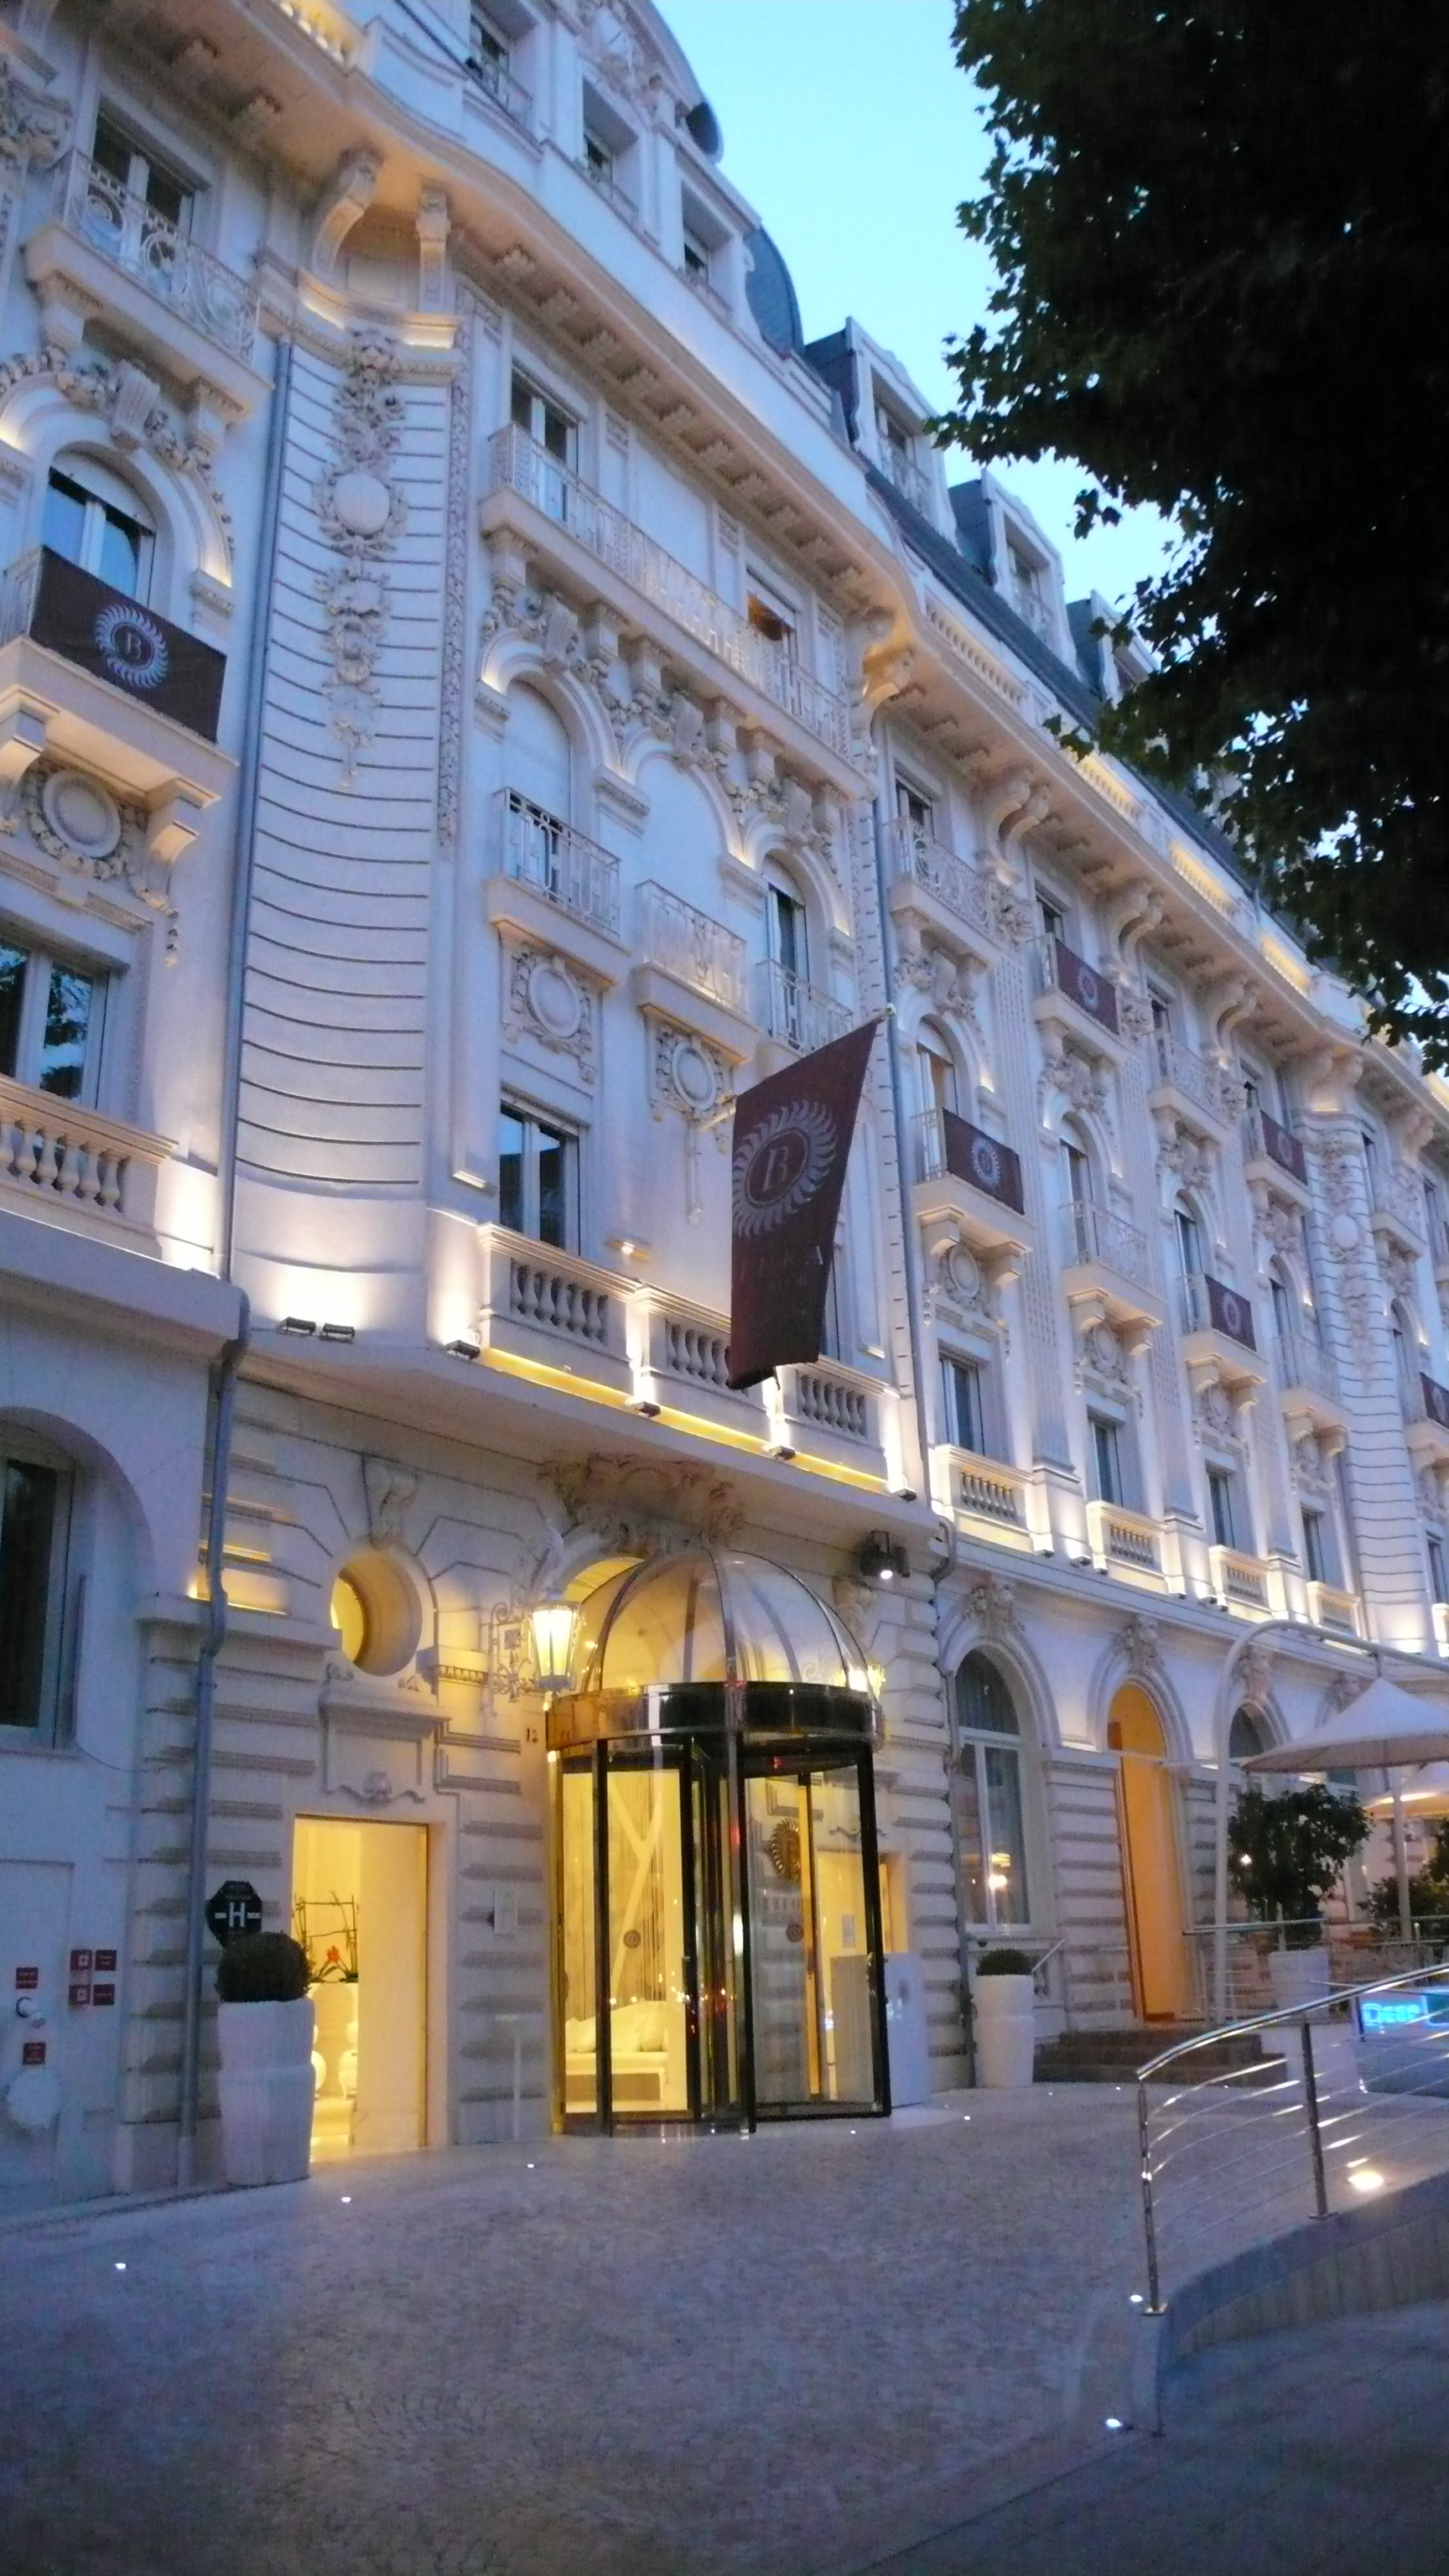 Hotel Boscolo Exedra Rome